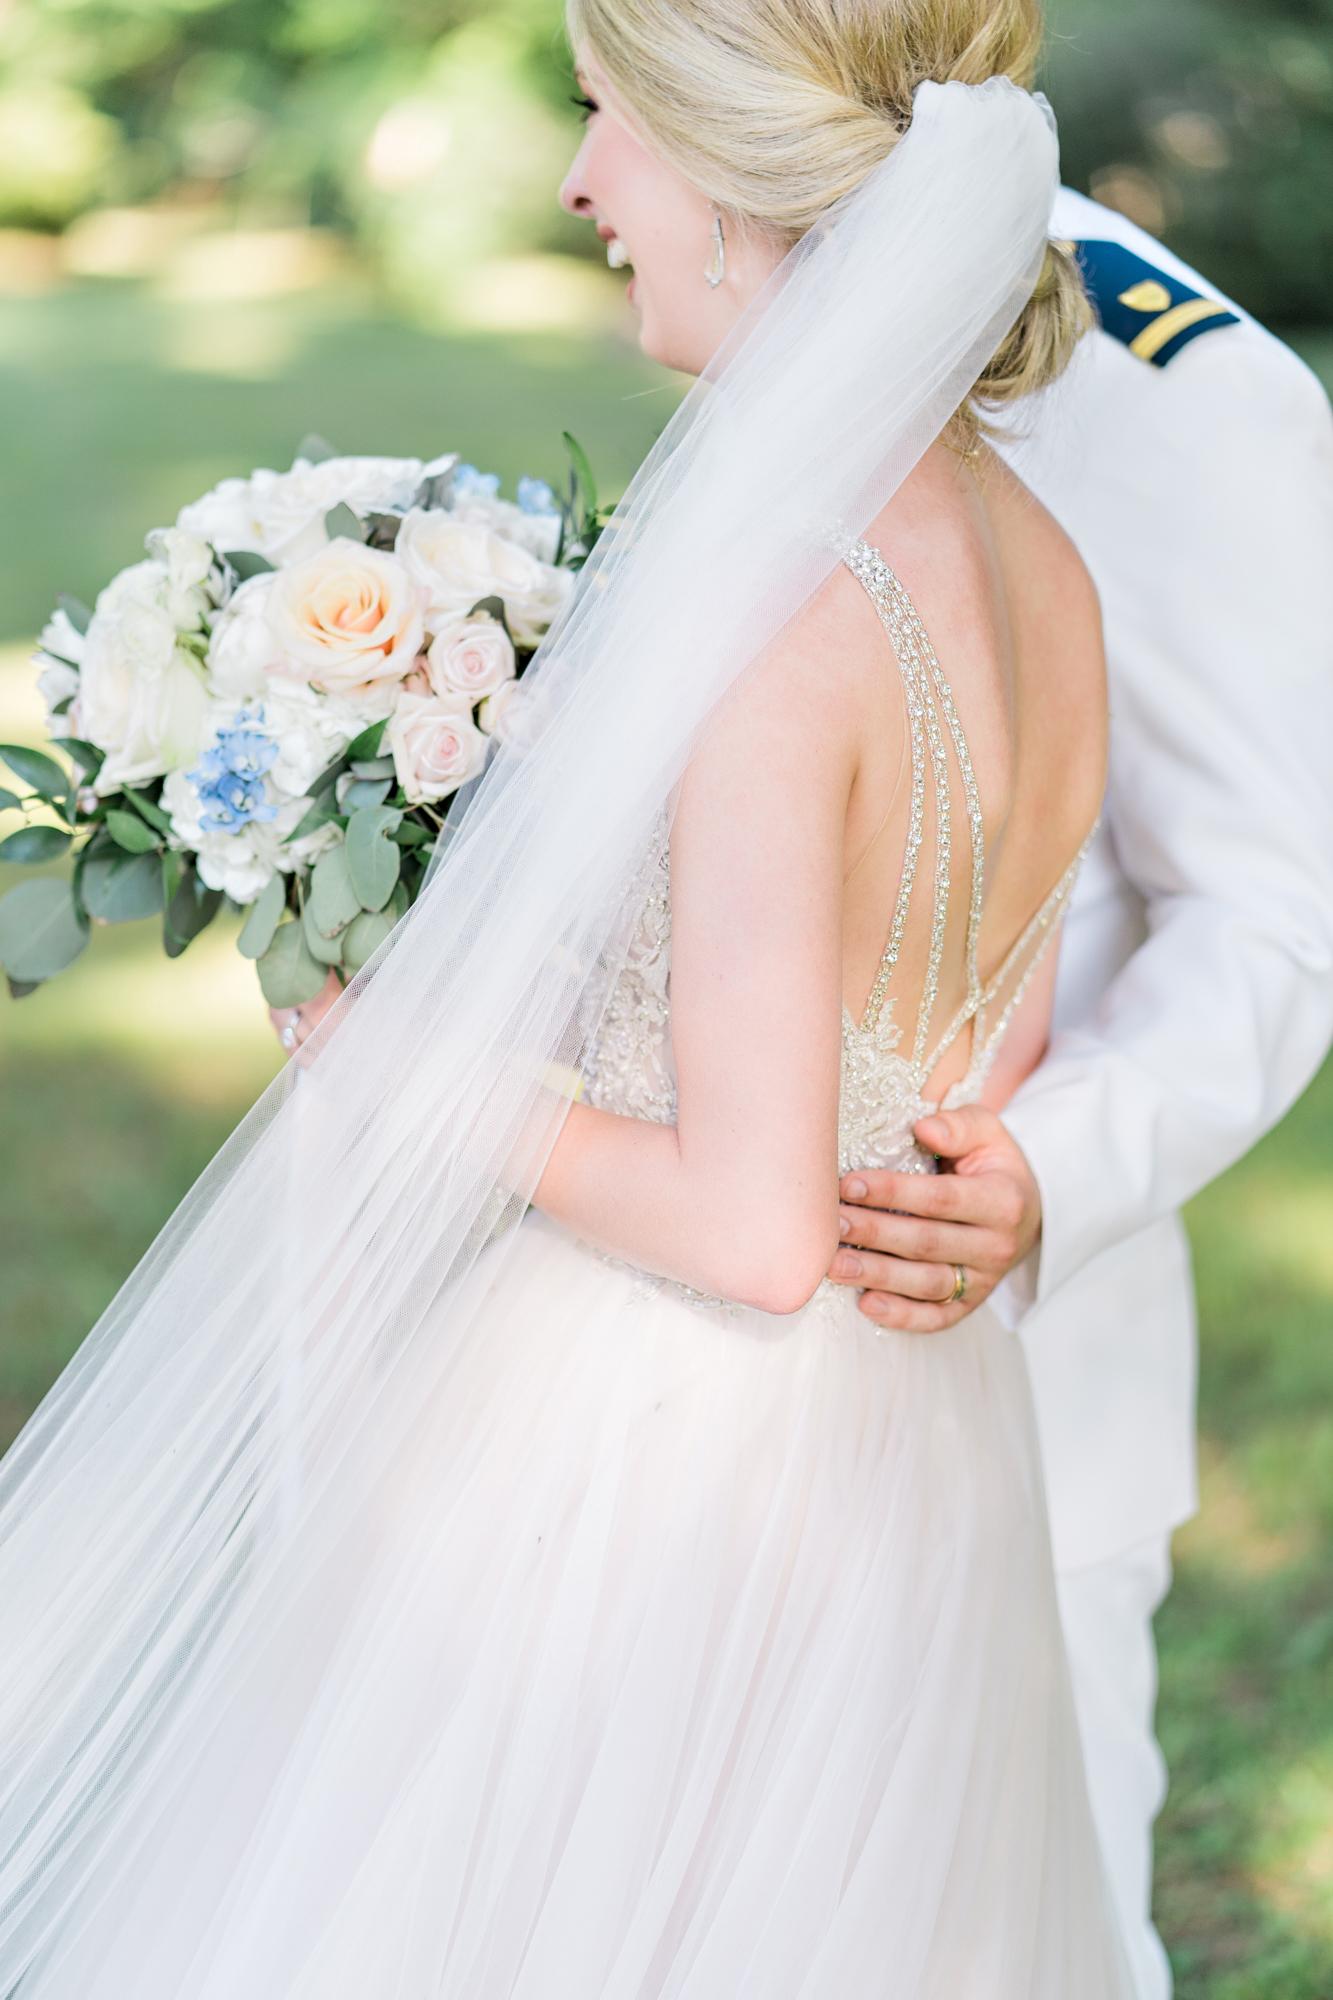 Alabama-Photographers-Nick-Drollette-Wedding-Photography-143.jpg